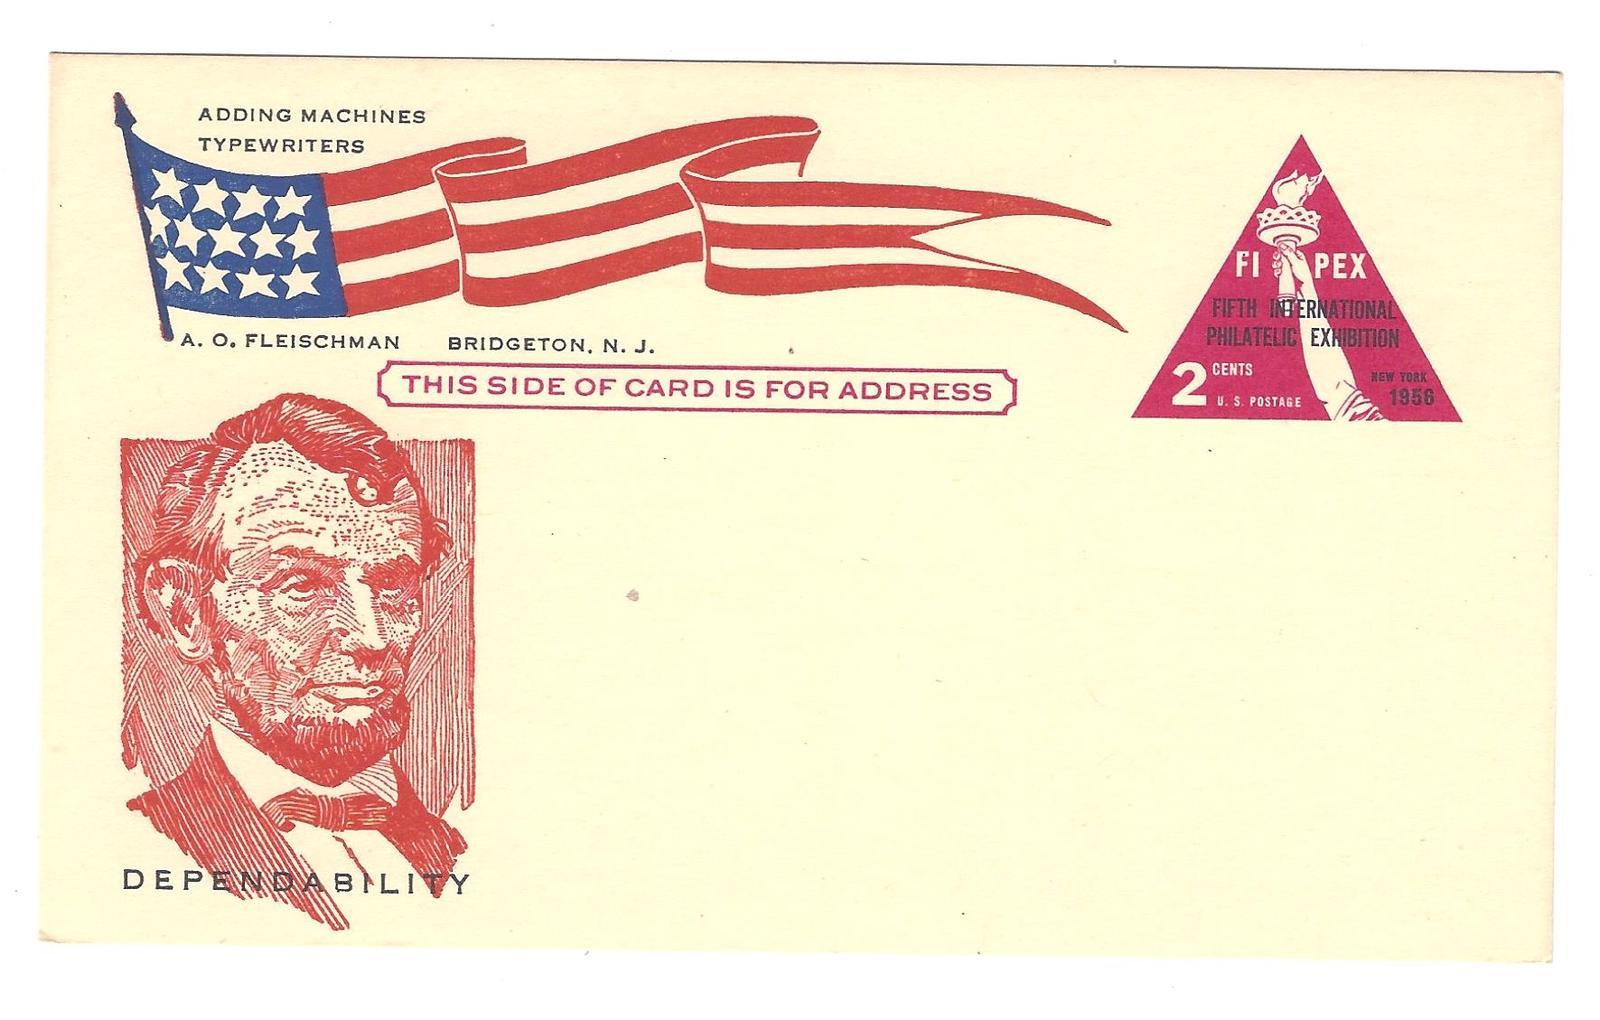 FIPEX Postal Card Lincoln Patriotic Cachet Fleischman Bridgeton NJ Advert UX44